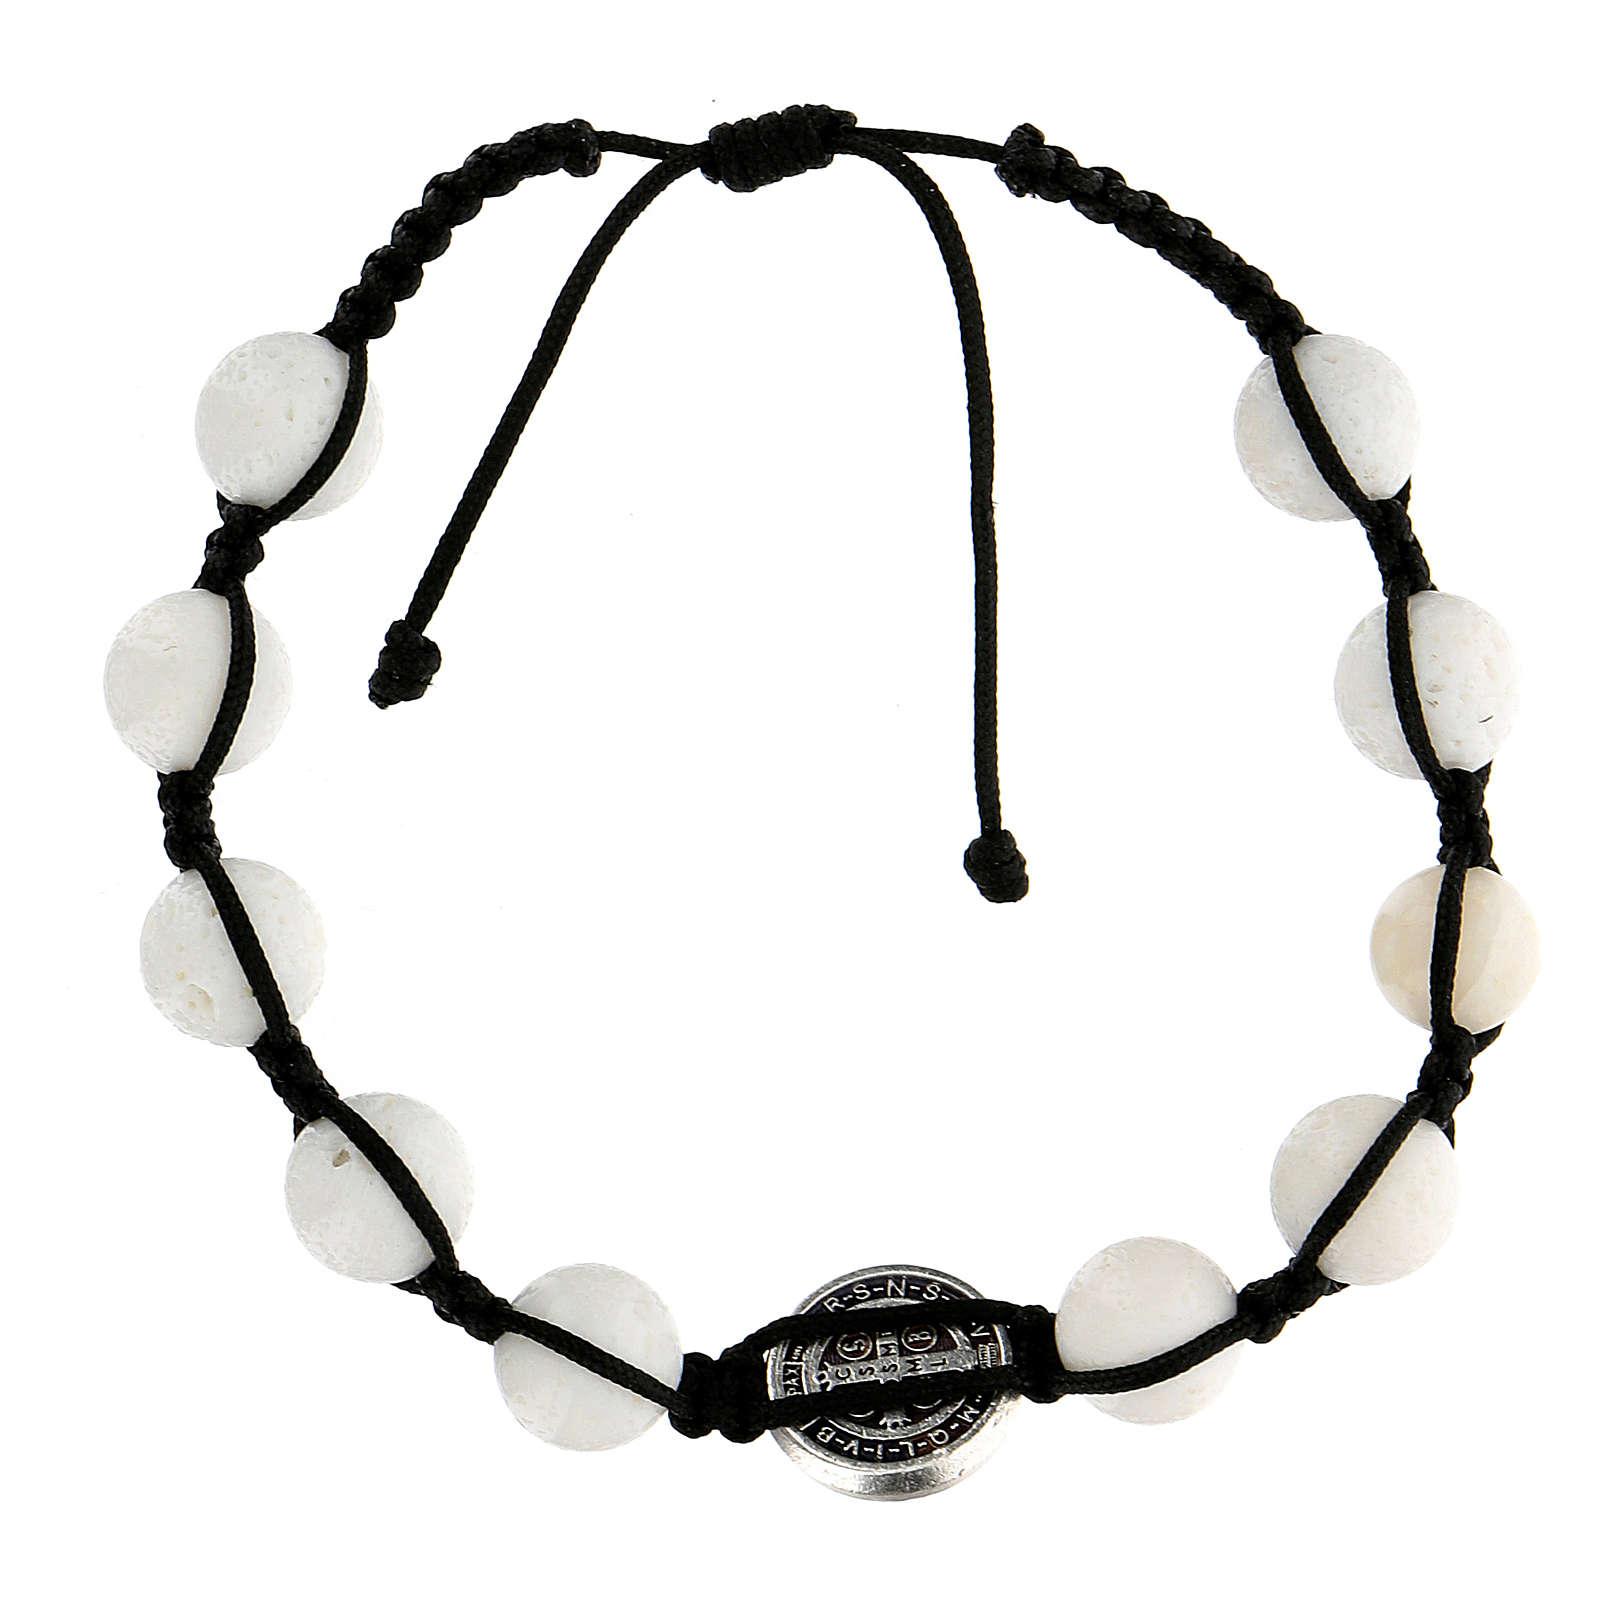 Bracelet corde 10 perles pierre polie médaille Medjugorje 4